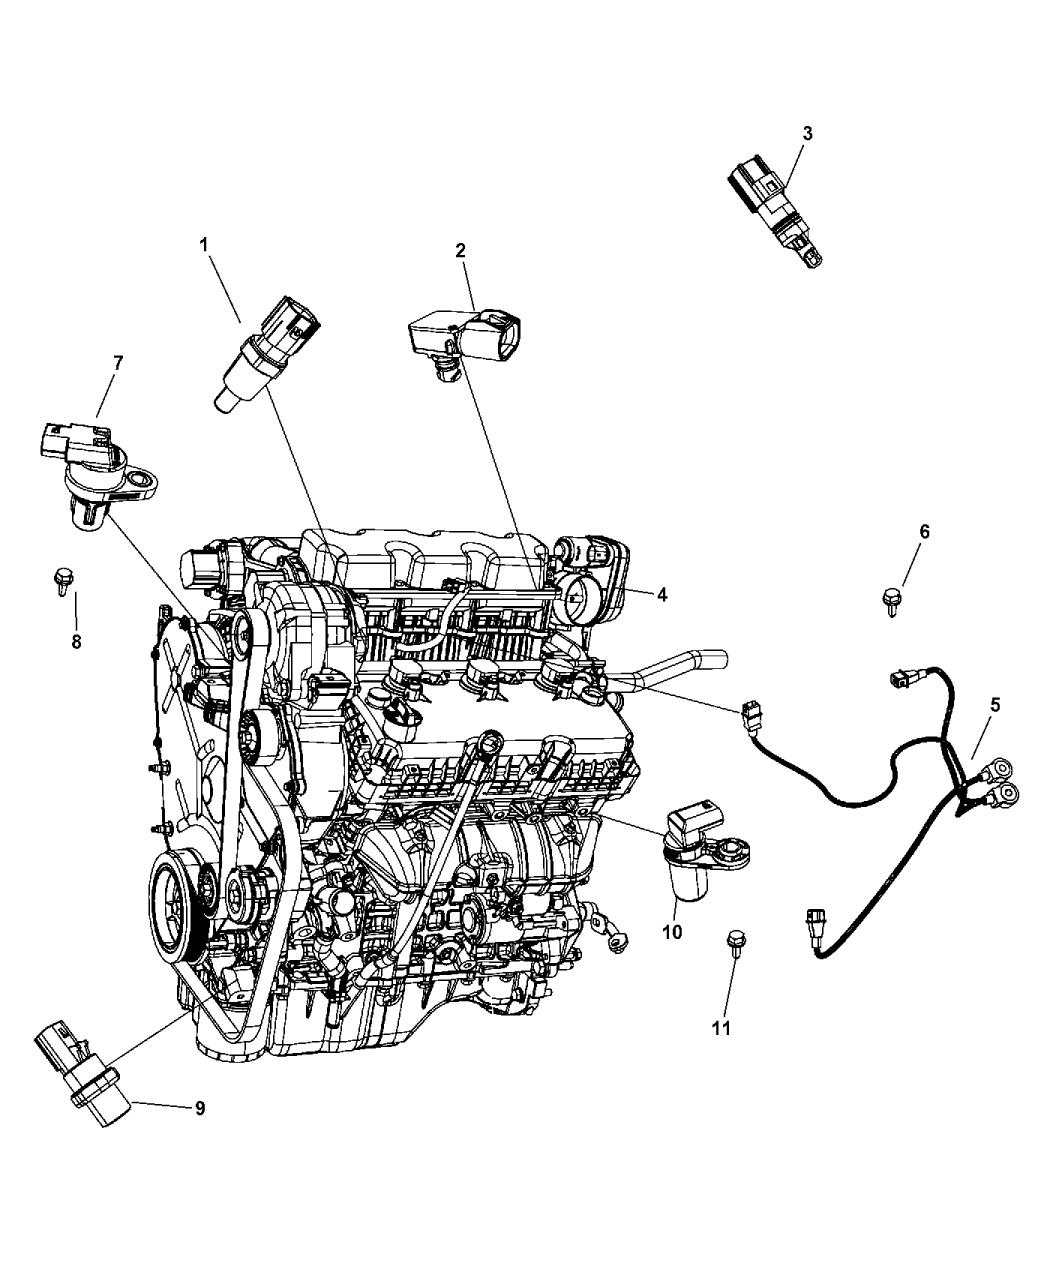 4606093ad genuine chrysler sensor detonation rh moparpartsgiant com 2009 Dodge Journey Wiring-Diagram 2009 dodge journey 2.4 engine diagram